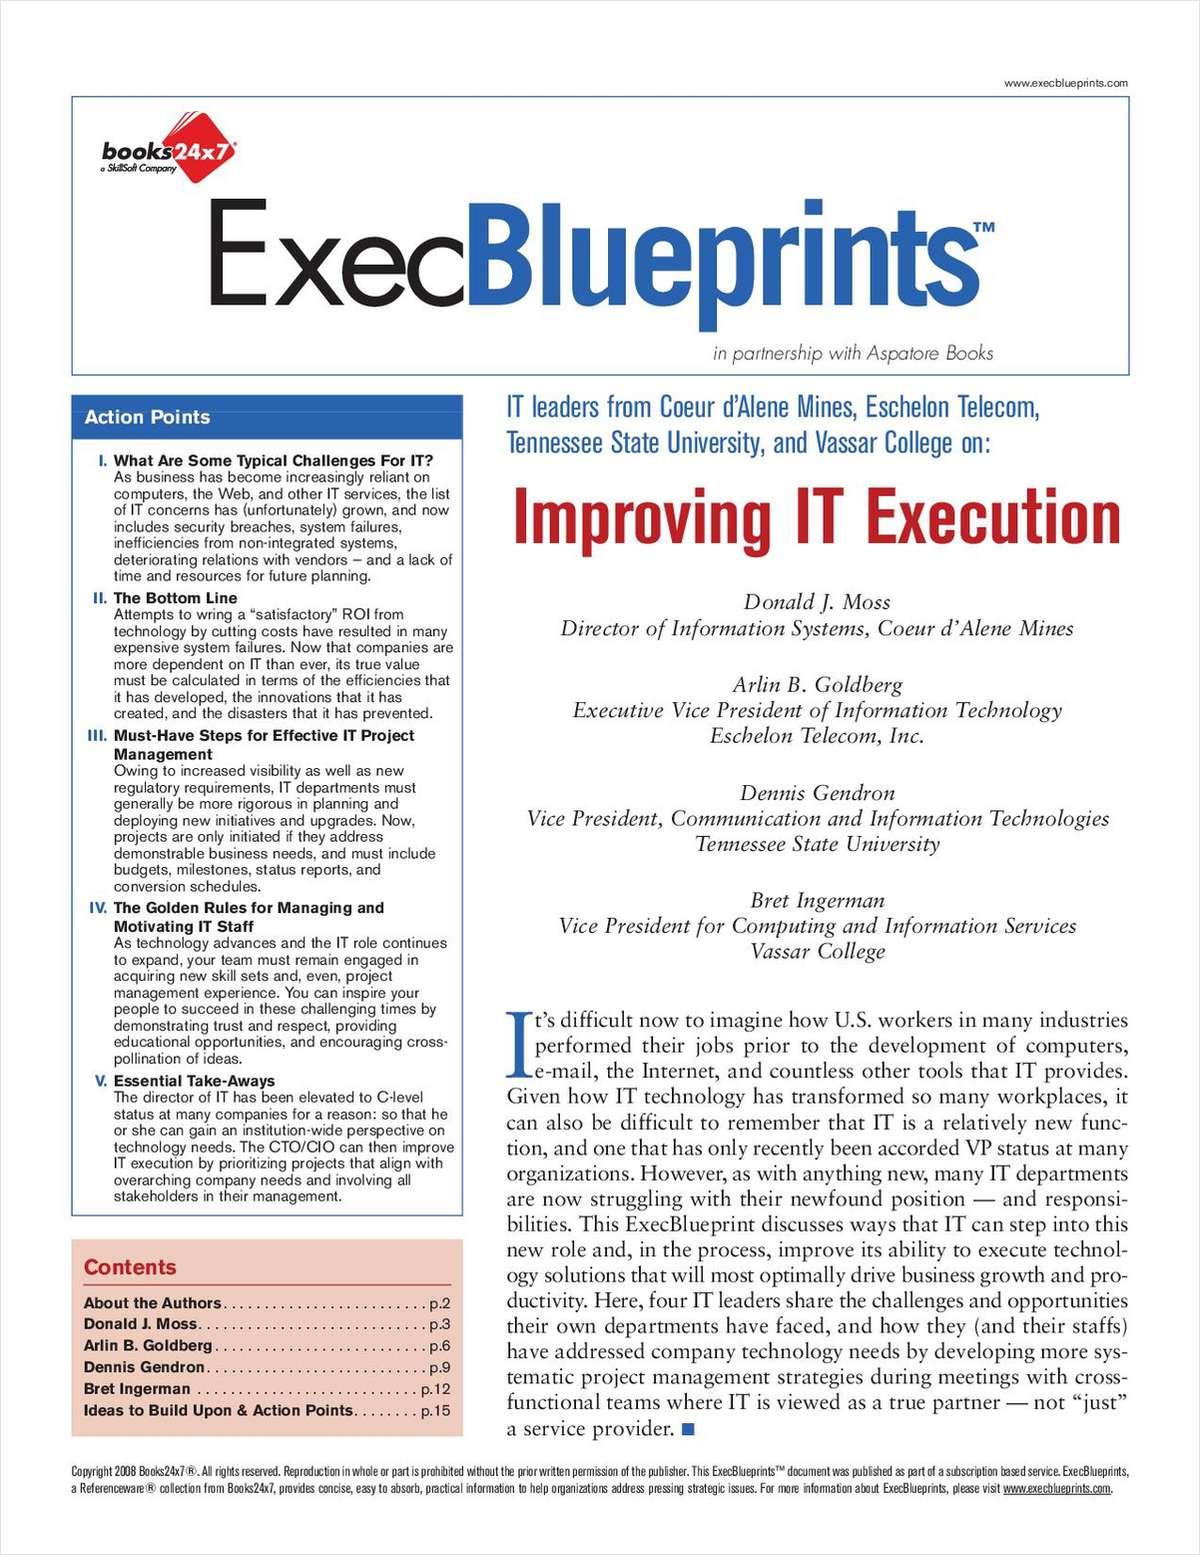 Improving IT Execution